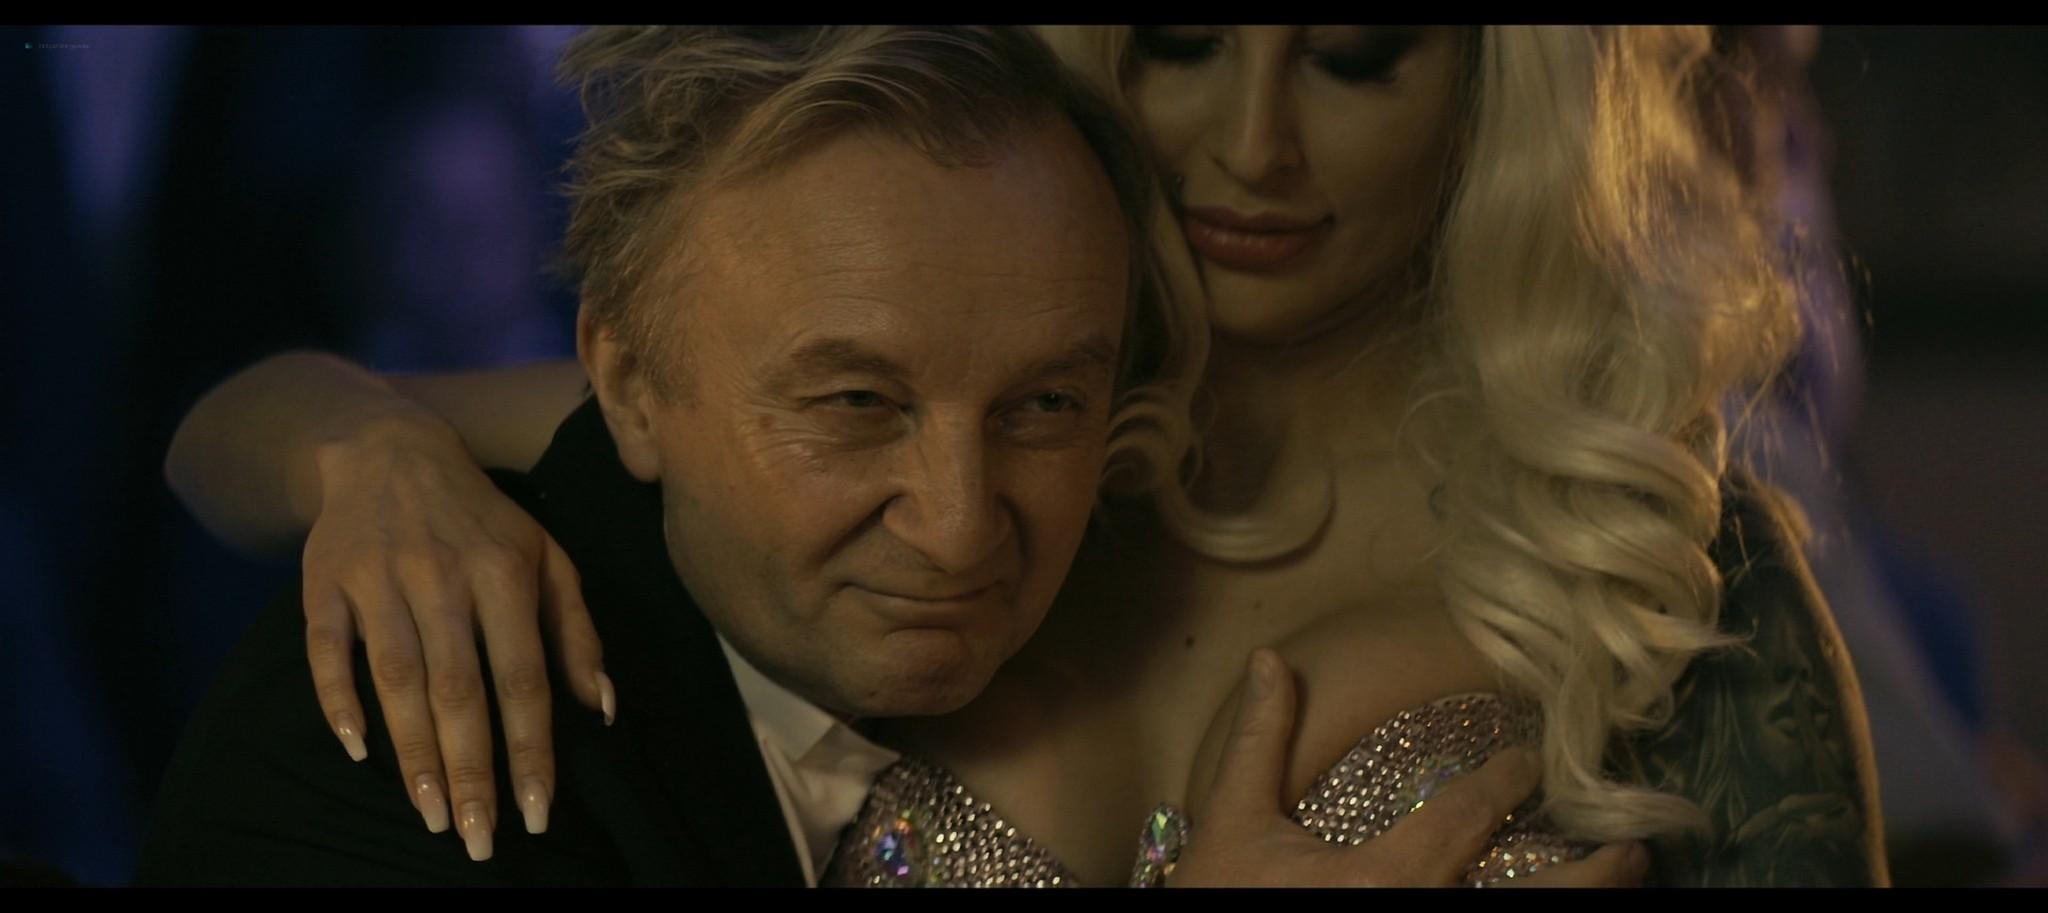 Katarzyna Warnke sex Aleksandra Nowicka Karolina Dziuba nude Petla PL 2020 1080 BluRay 15